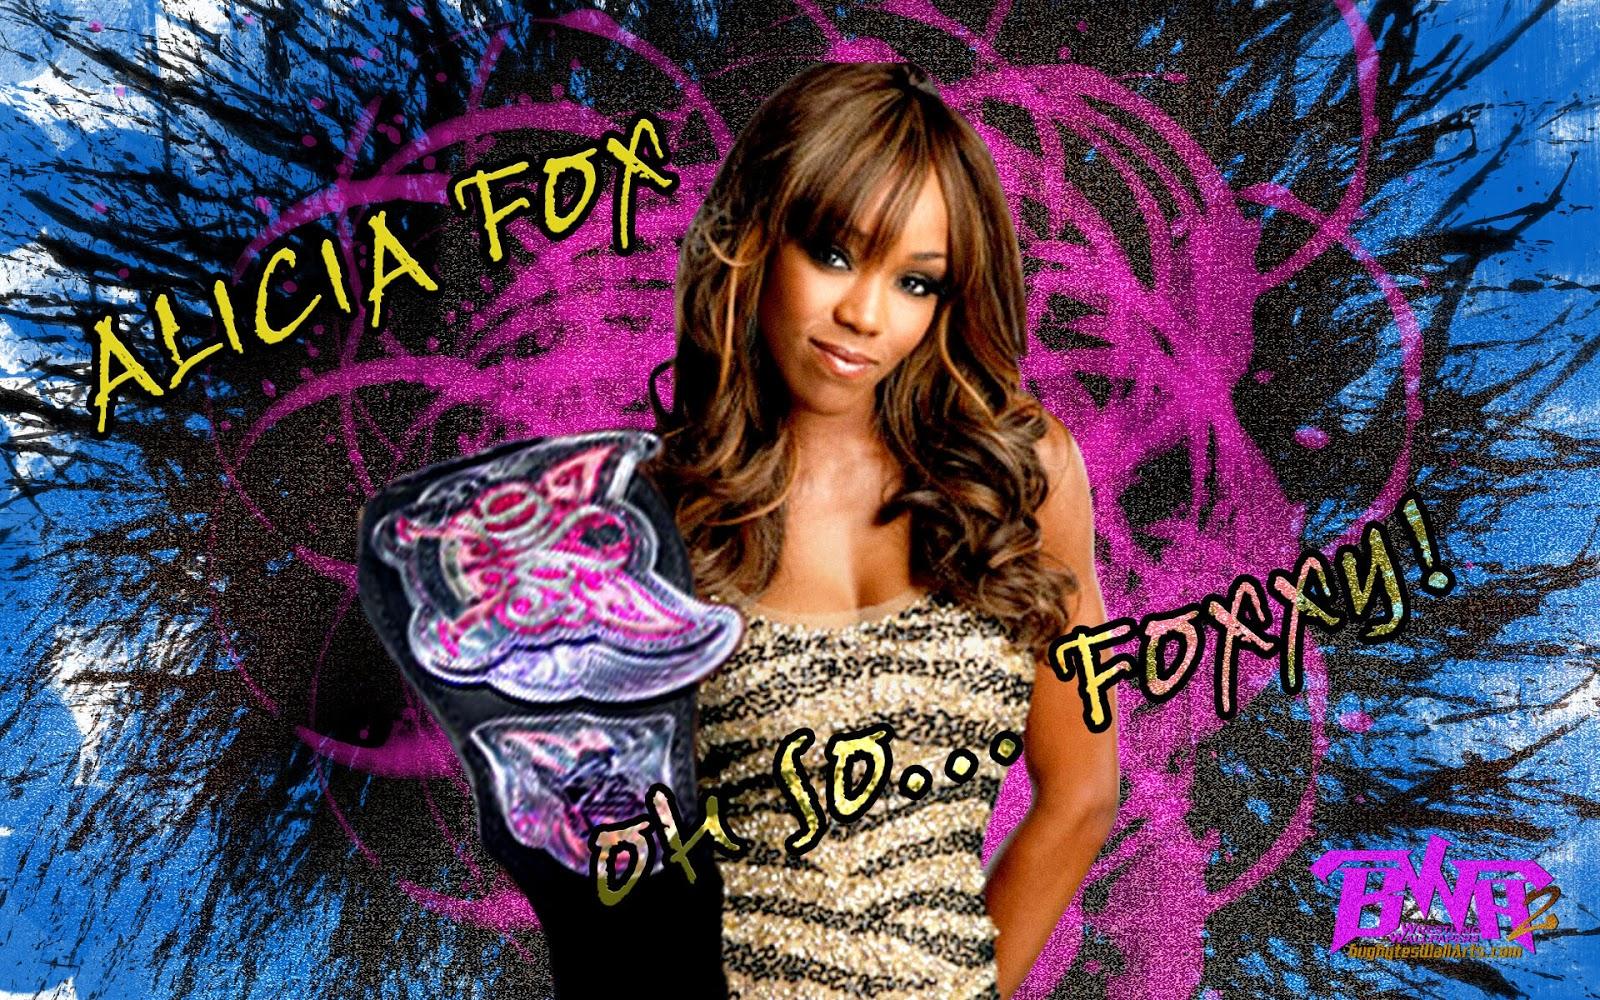 Alicia Fox Wallpapers Bodybuilding Wallpapers Free Download